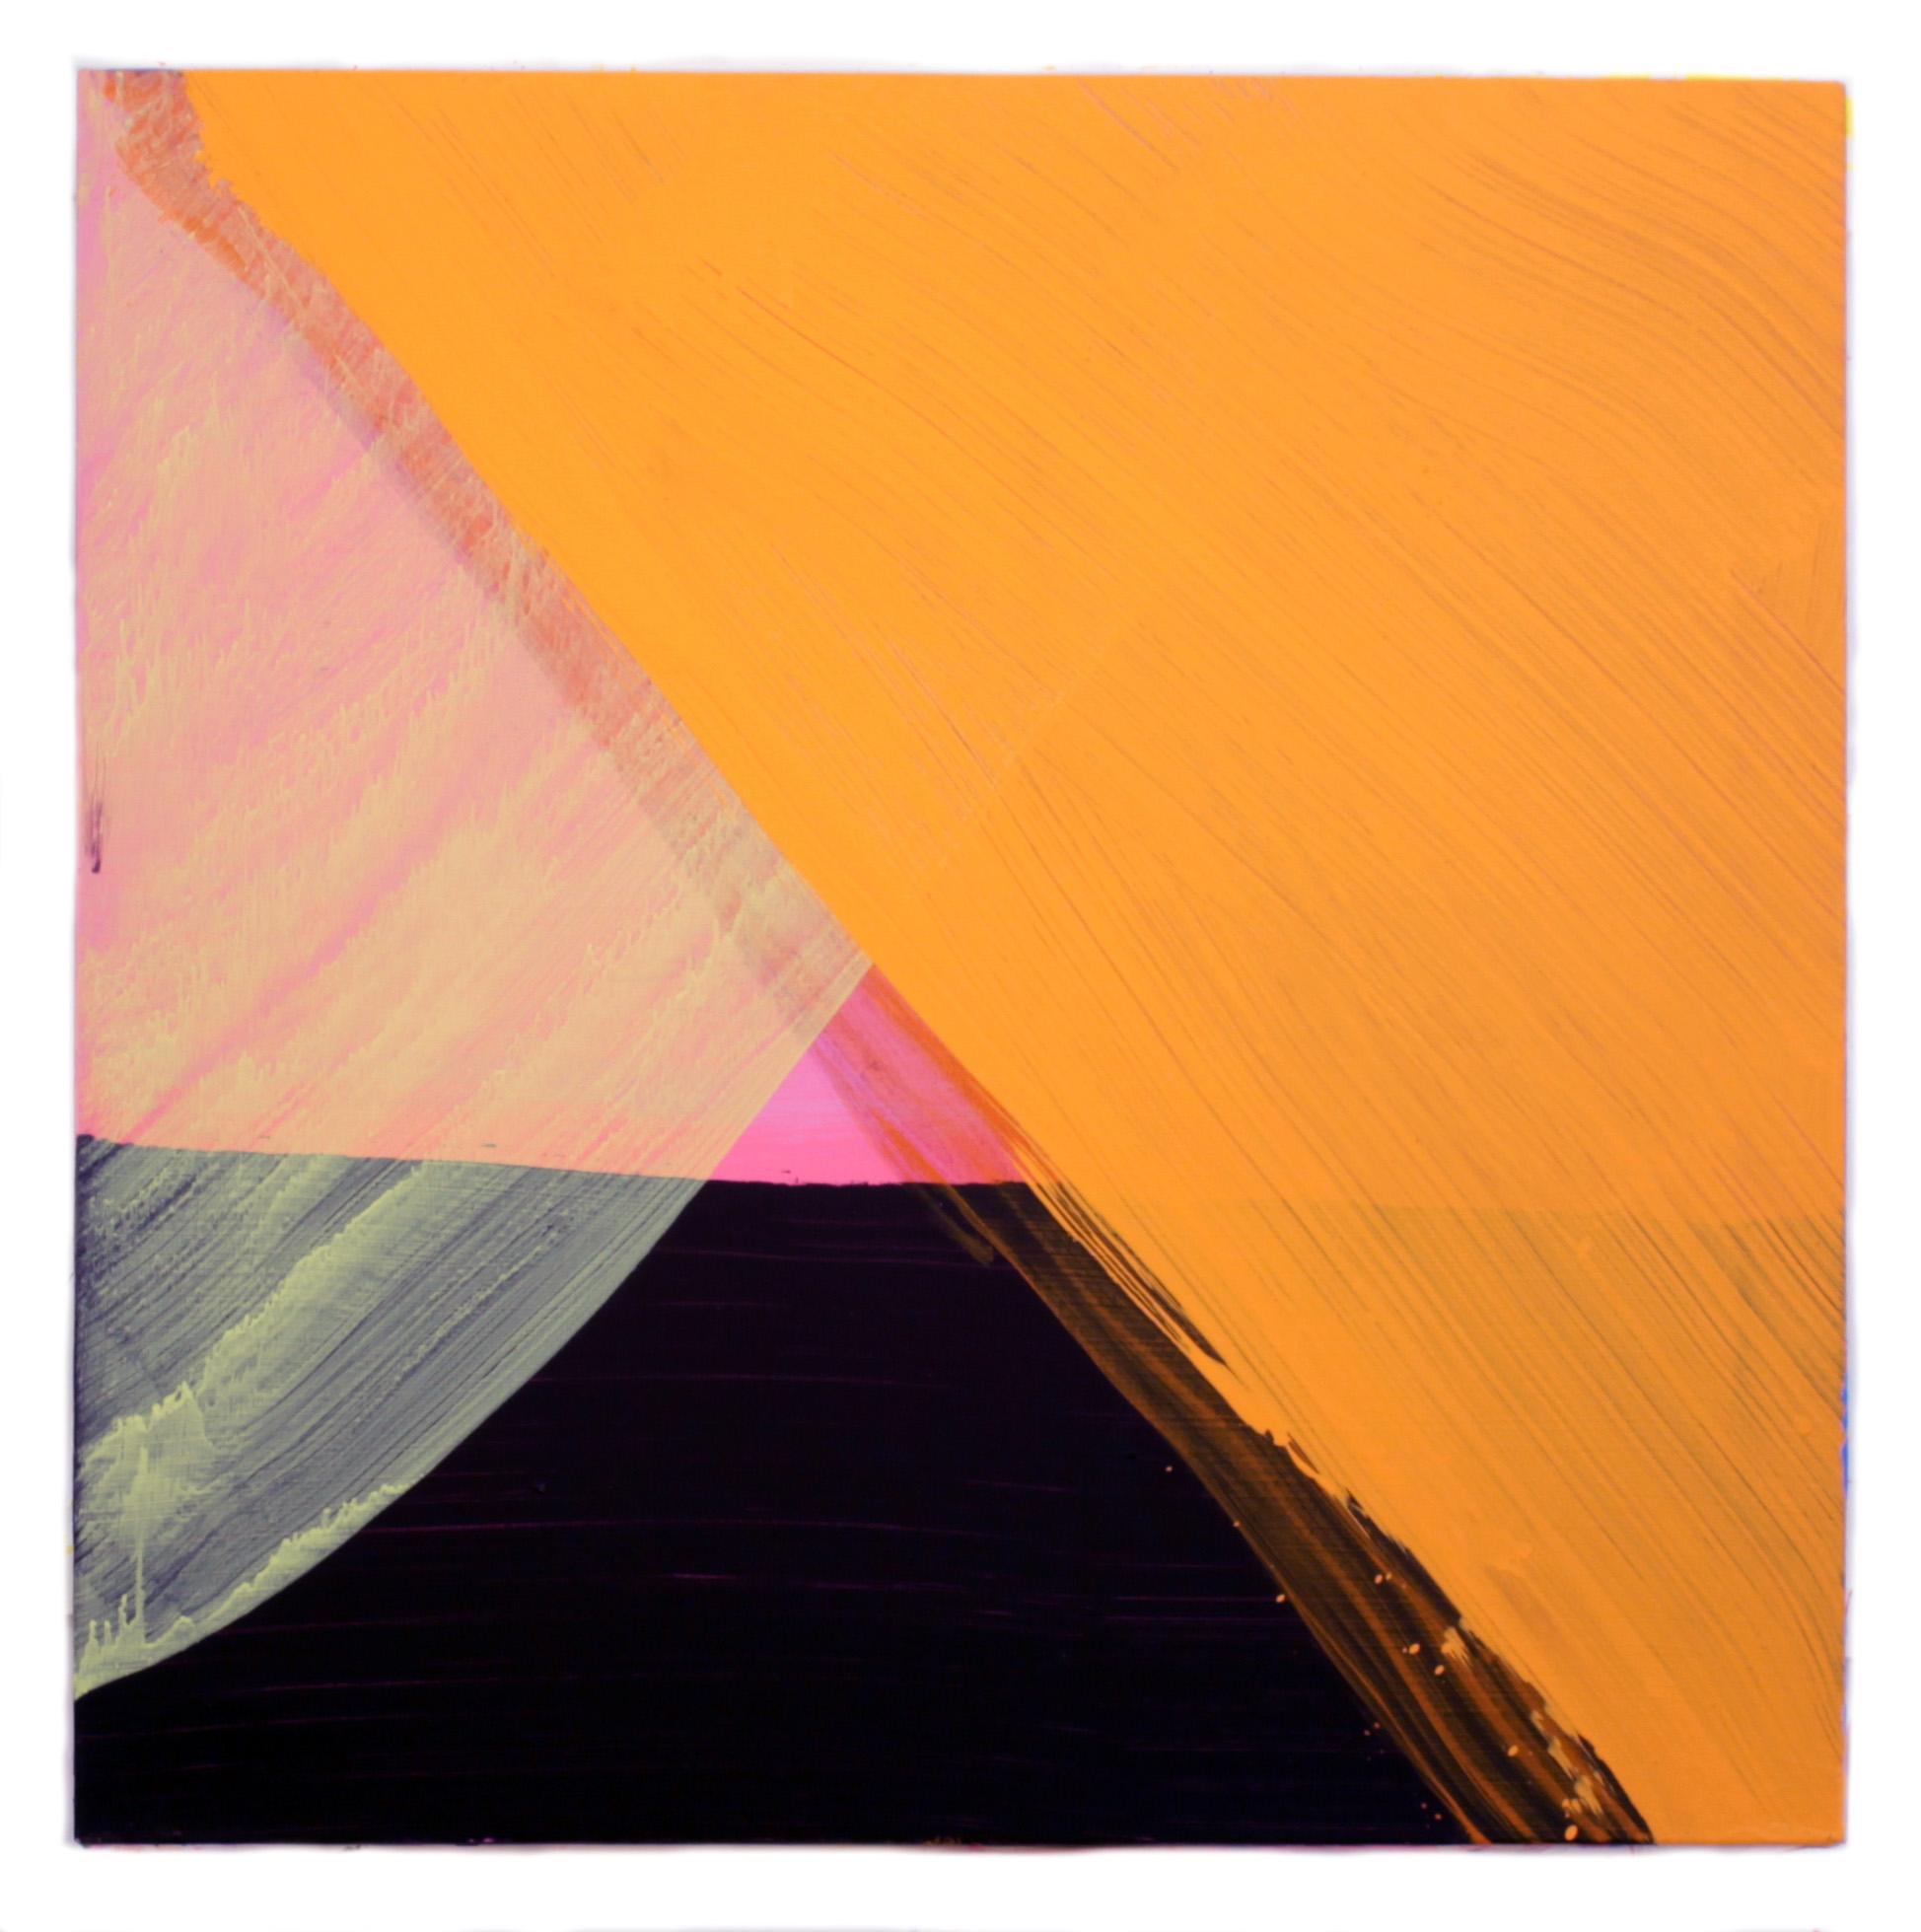 Hartford Art School Galleries_Cat Balco_Orange Open Triangles_ 2019_Acrylic on canvas_40%22x 40%22_$5,500.jpg